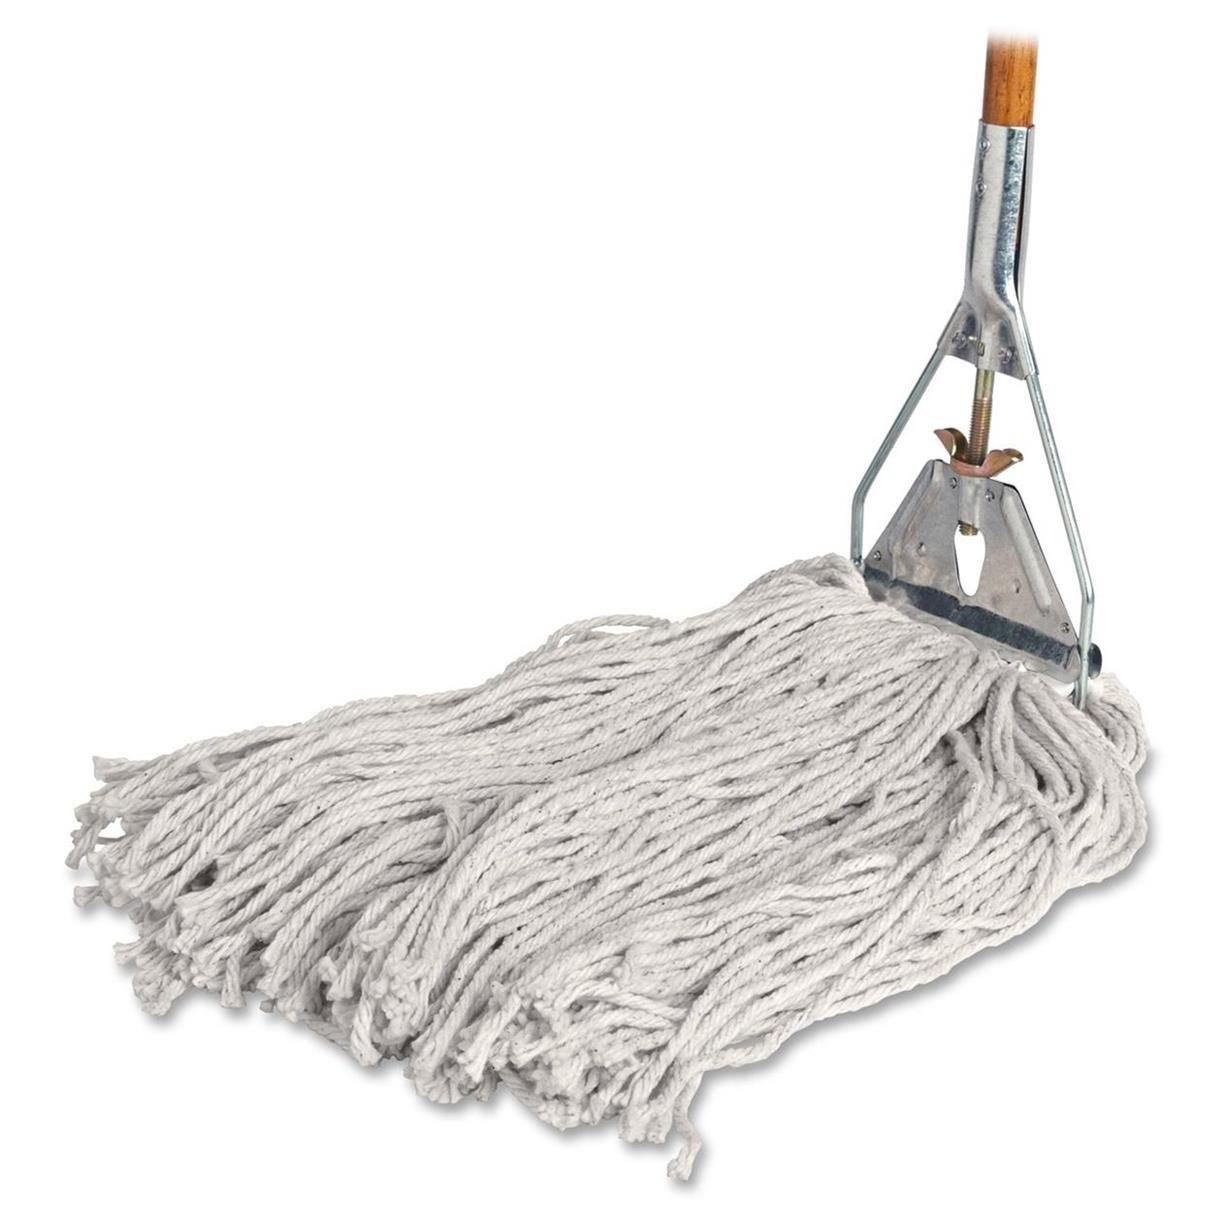 Amazon Com Genuine Joe Gjo54201 Cotton Wet Mop With Handle 60 Width X 0 94 Height Cotton Headwood Handle Lightweight Industrial Scientific